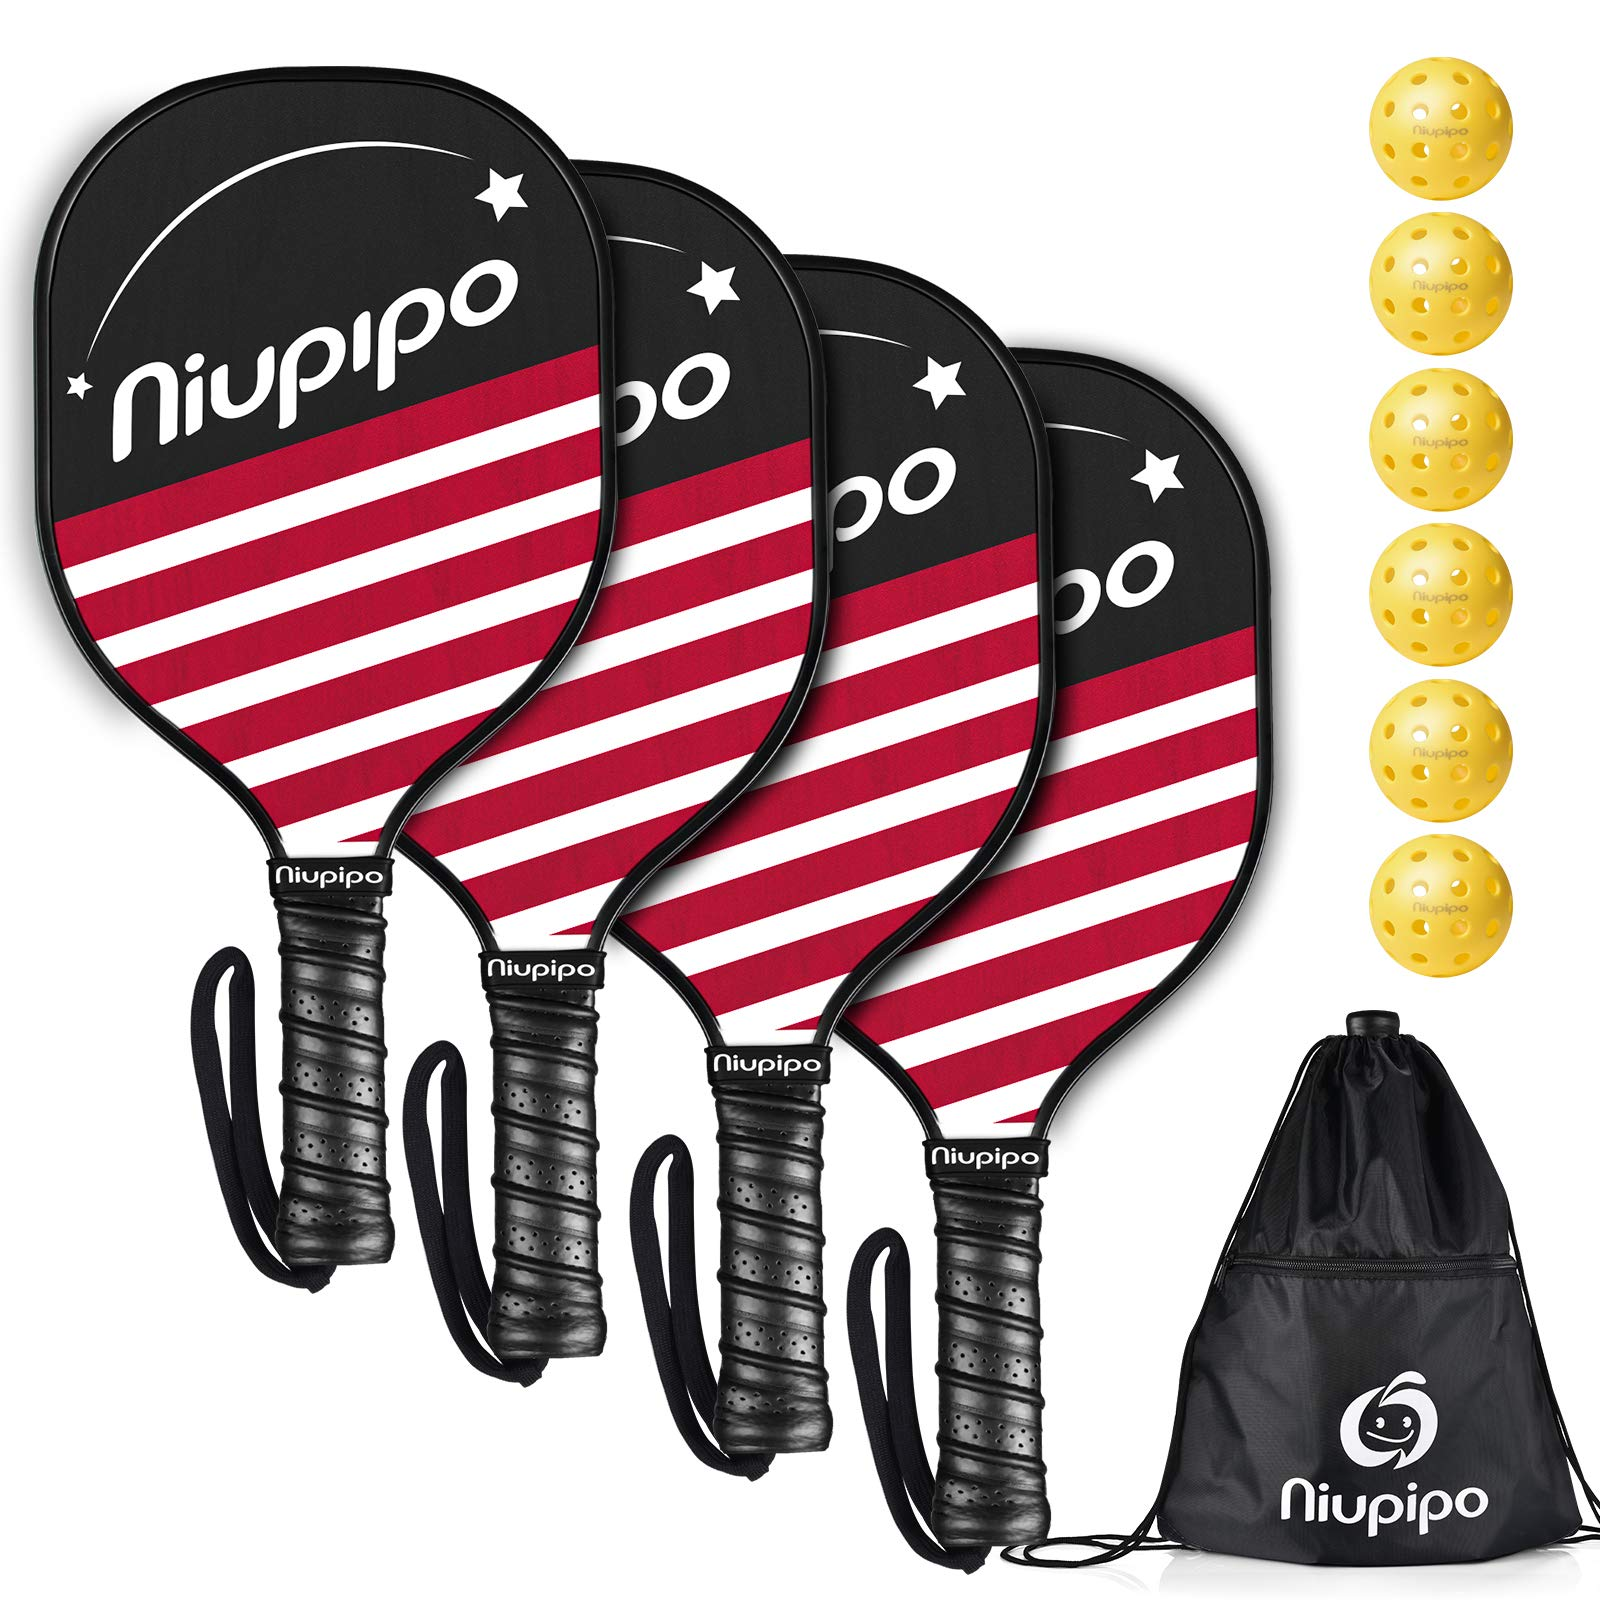 niupipo Pickleball Paddles Pickleball Set 4 Paddles with 6 B